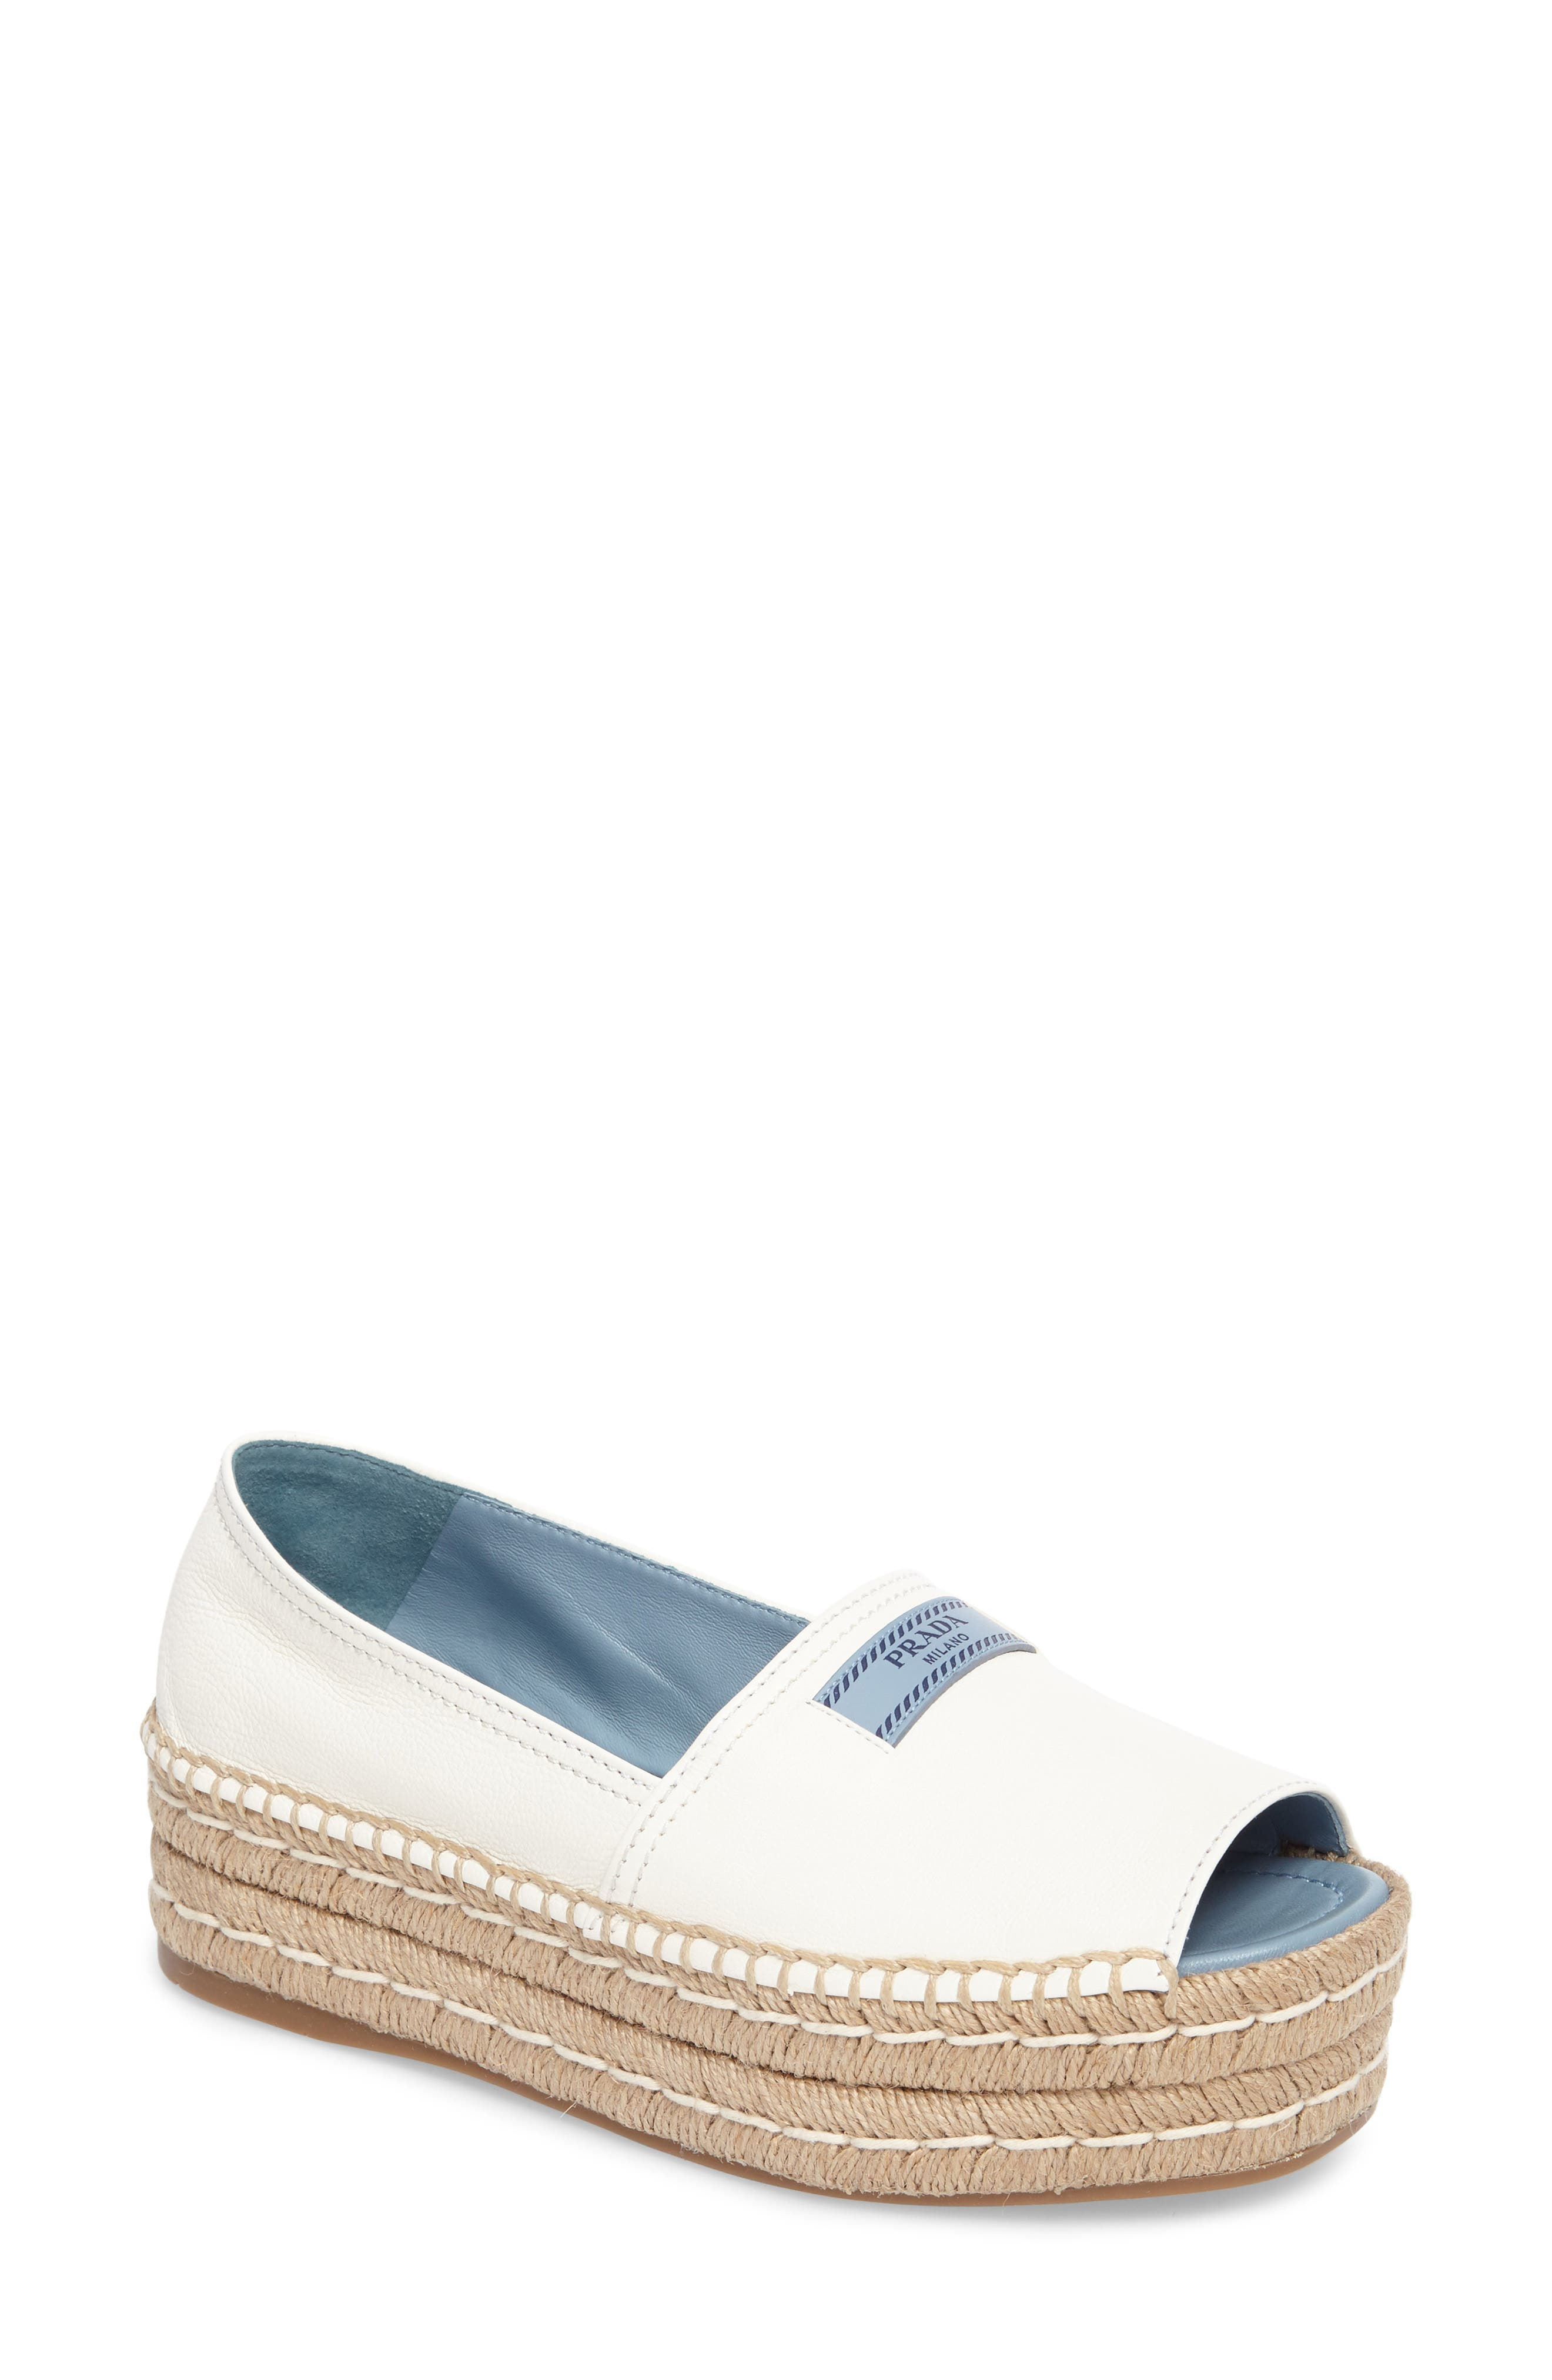 Prada Peep Toe Flatform Espadrille (Women)